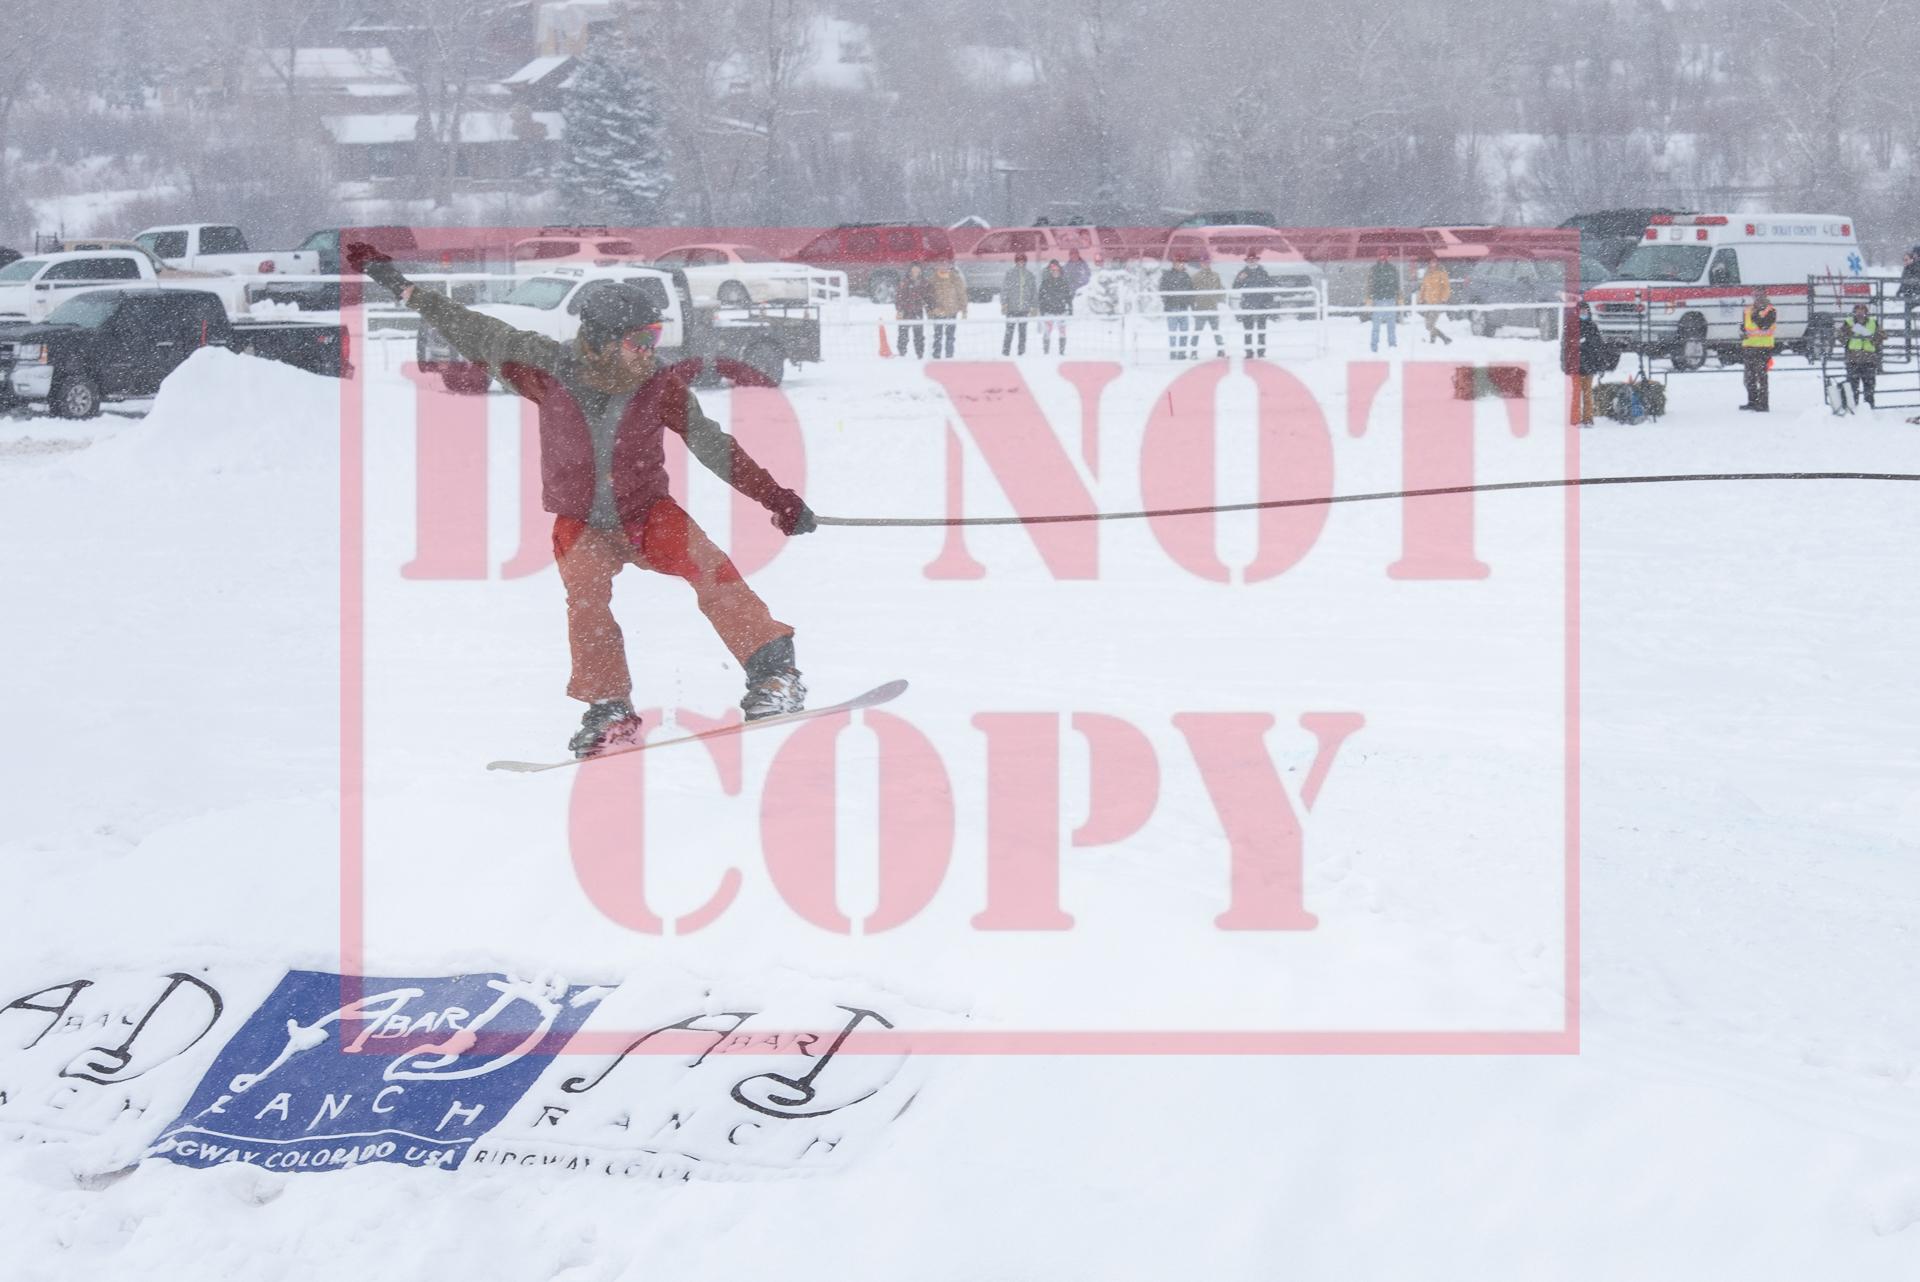 - JW Goode - Snowboard 6